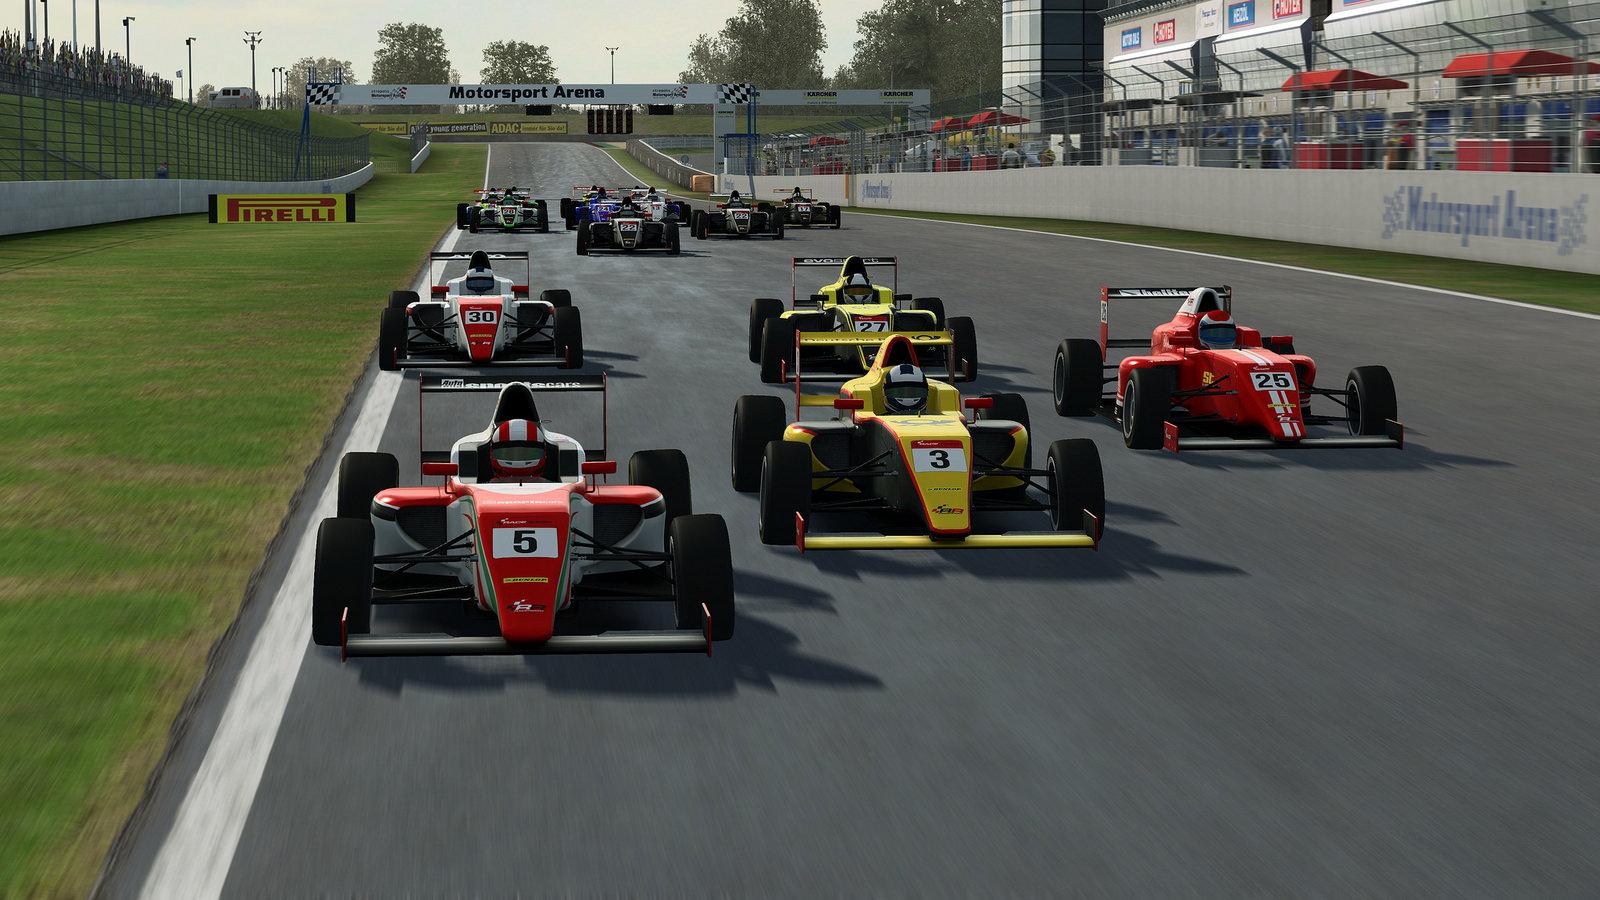 R3e Formula 4 Car Available Virtualr Net 100